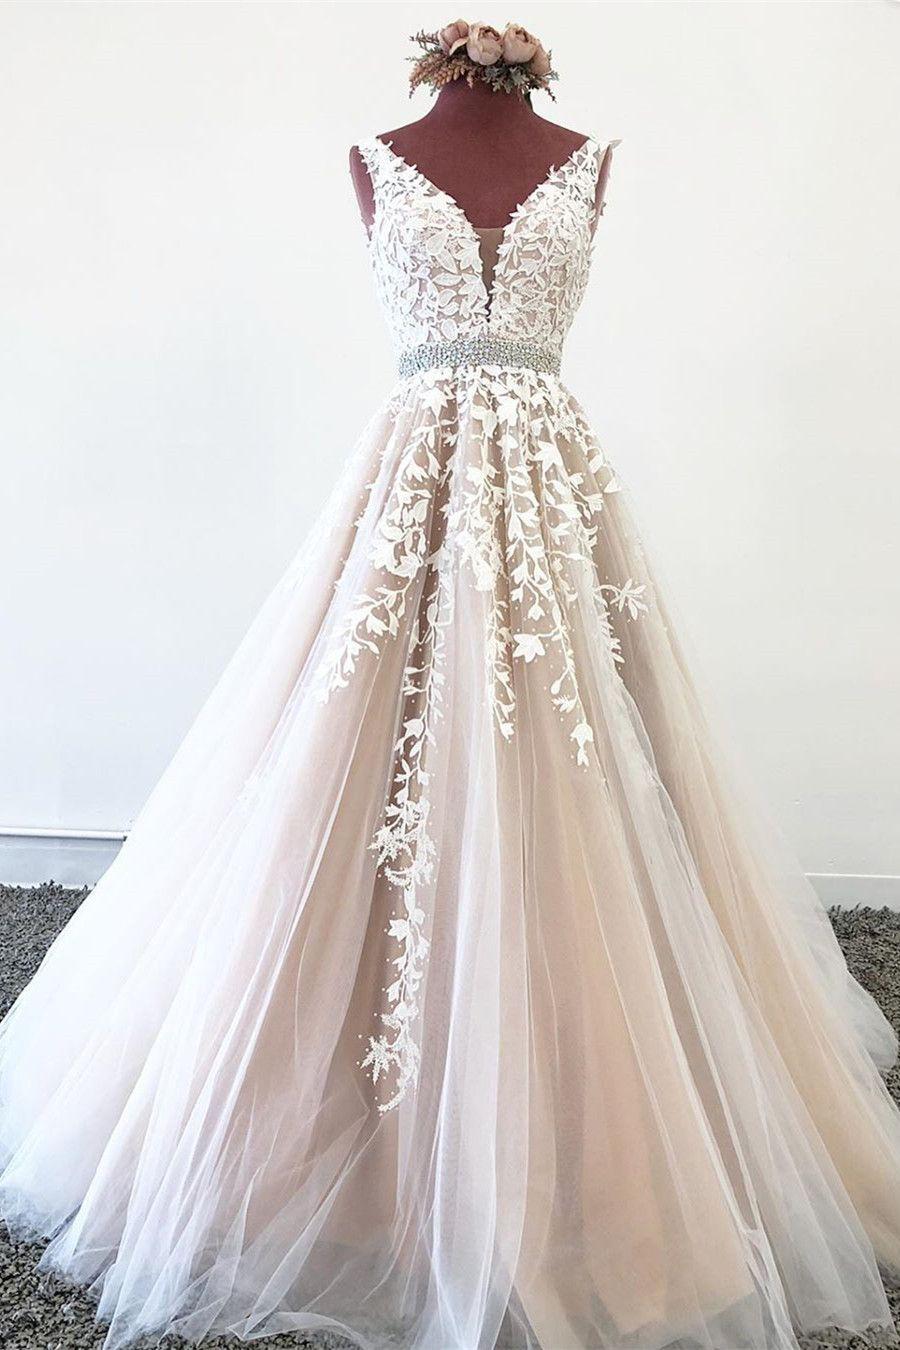 Elegant V Neck Backless Pink Tulle Lace Appliques Long Prom Dress OHC014 – Tulle Prom Dresses